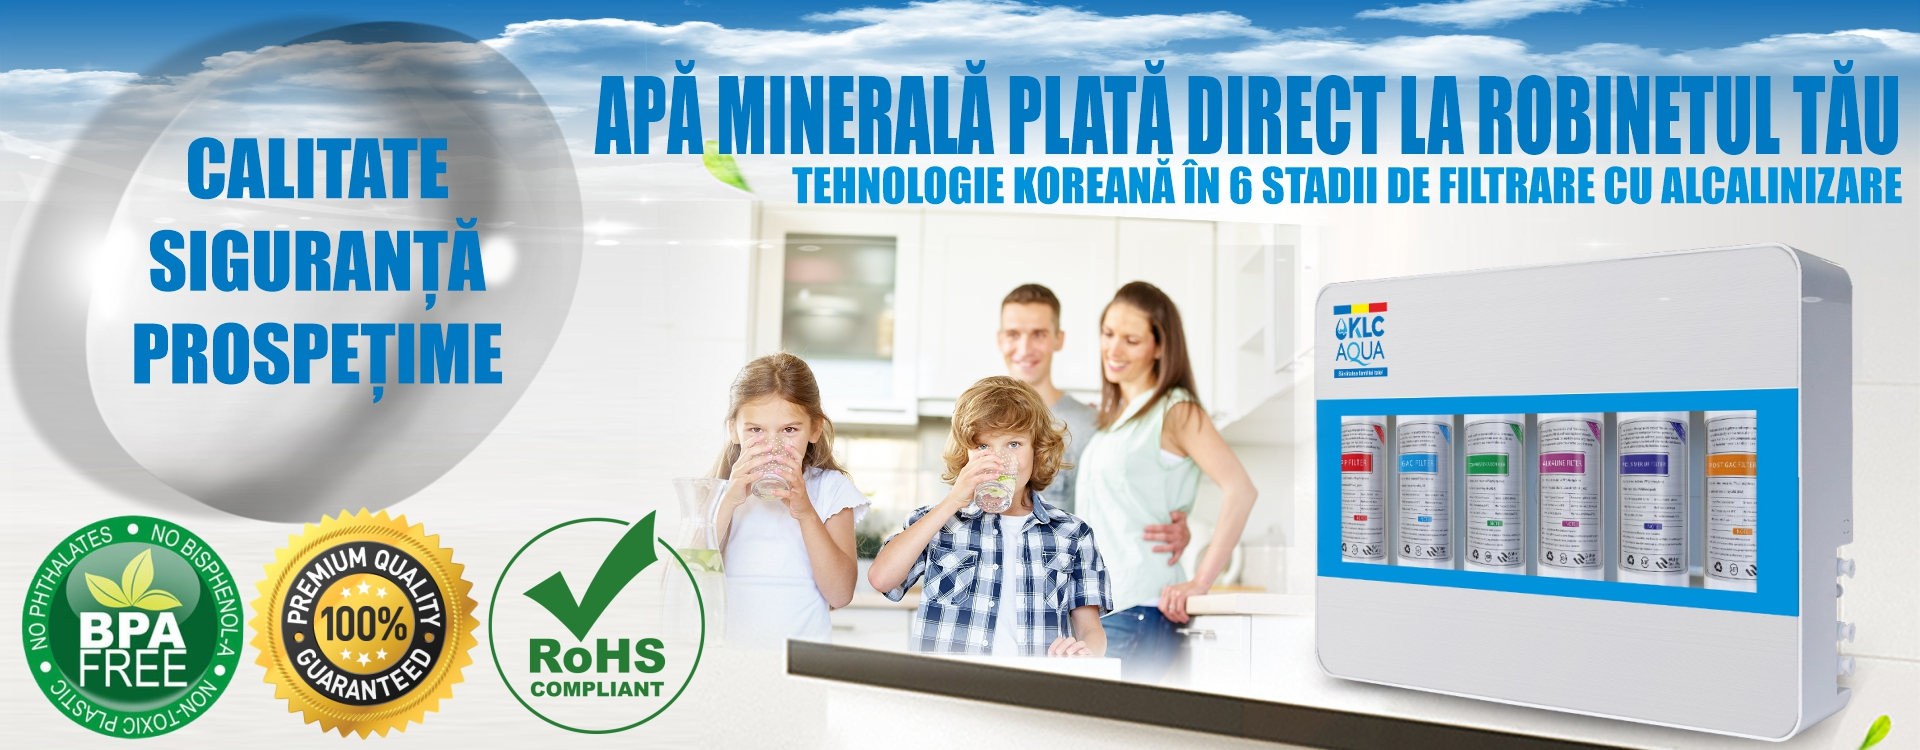 Apa minerala plata direct la robinetul tau